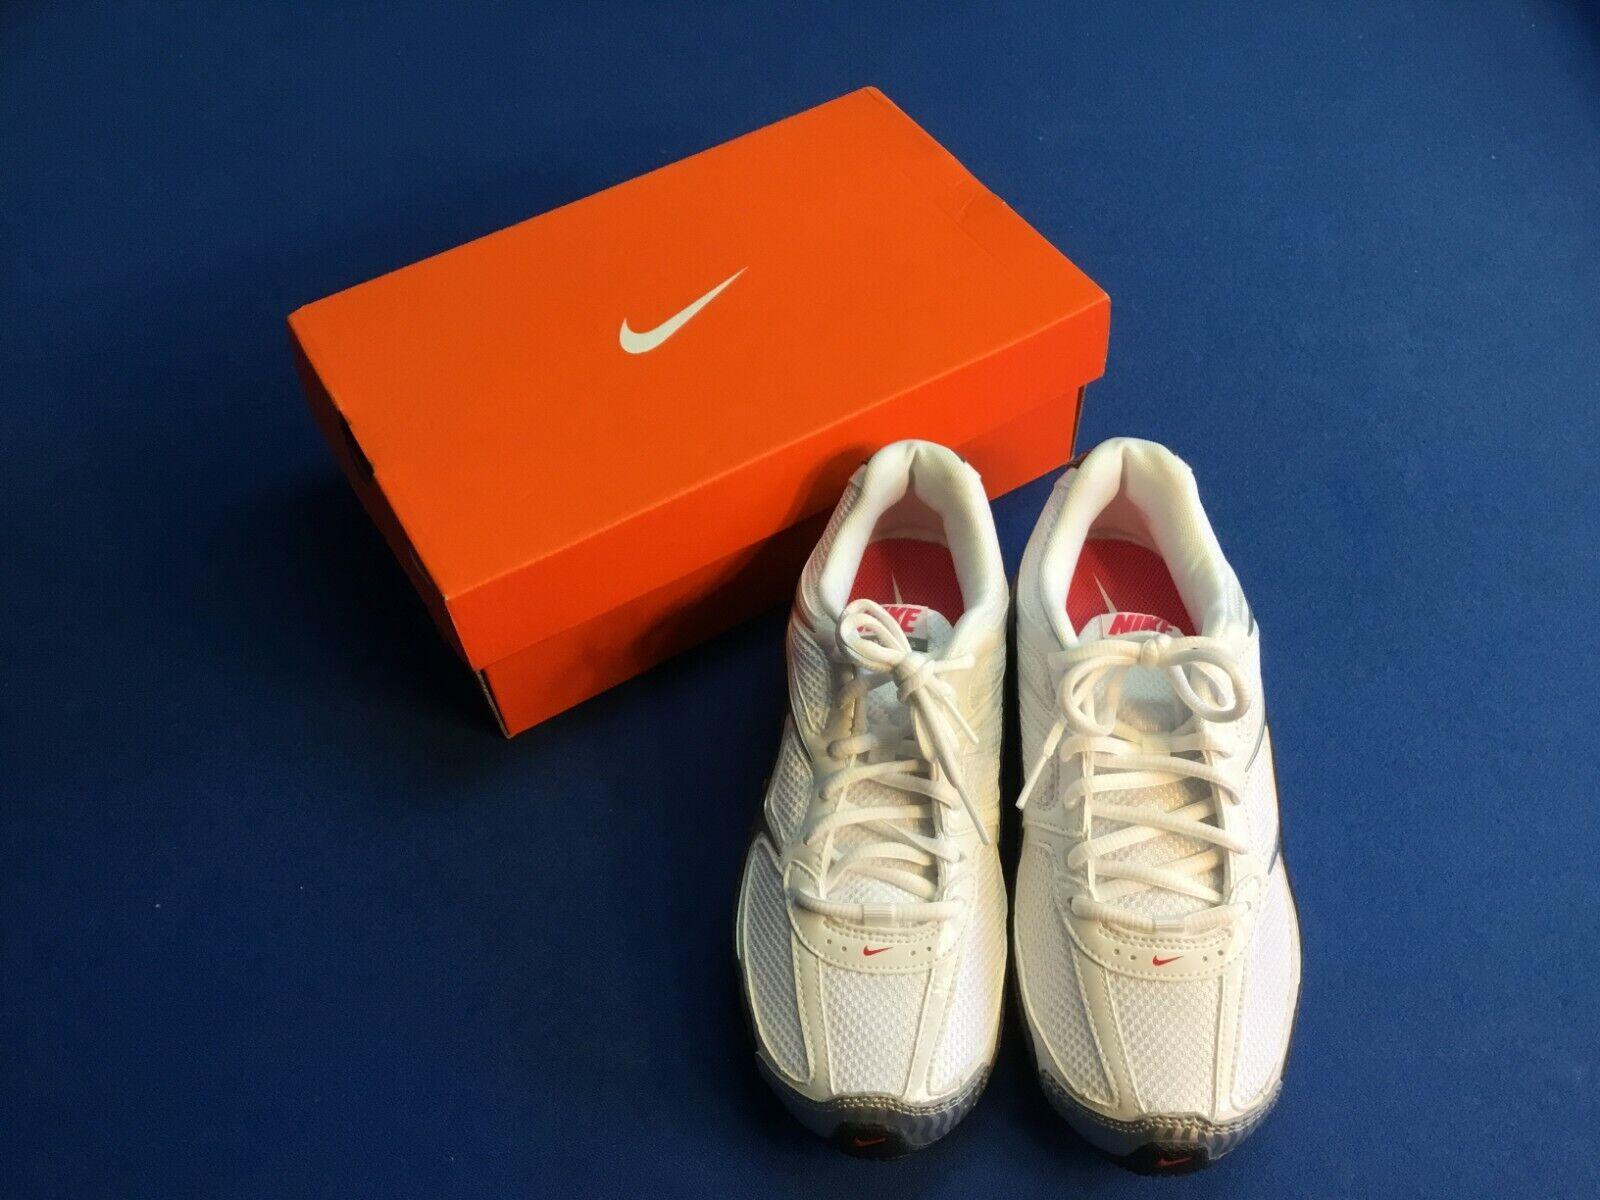 Donna Nike Reax Run 5 Scarpe da Ginnastica, Bianco, Misura 7, Nuovo